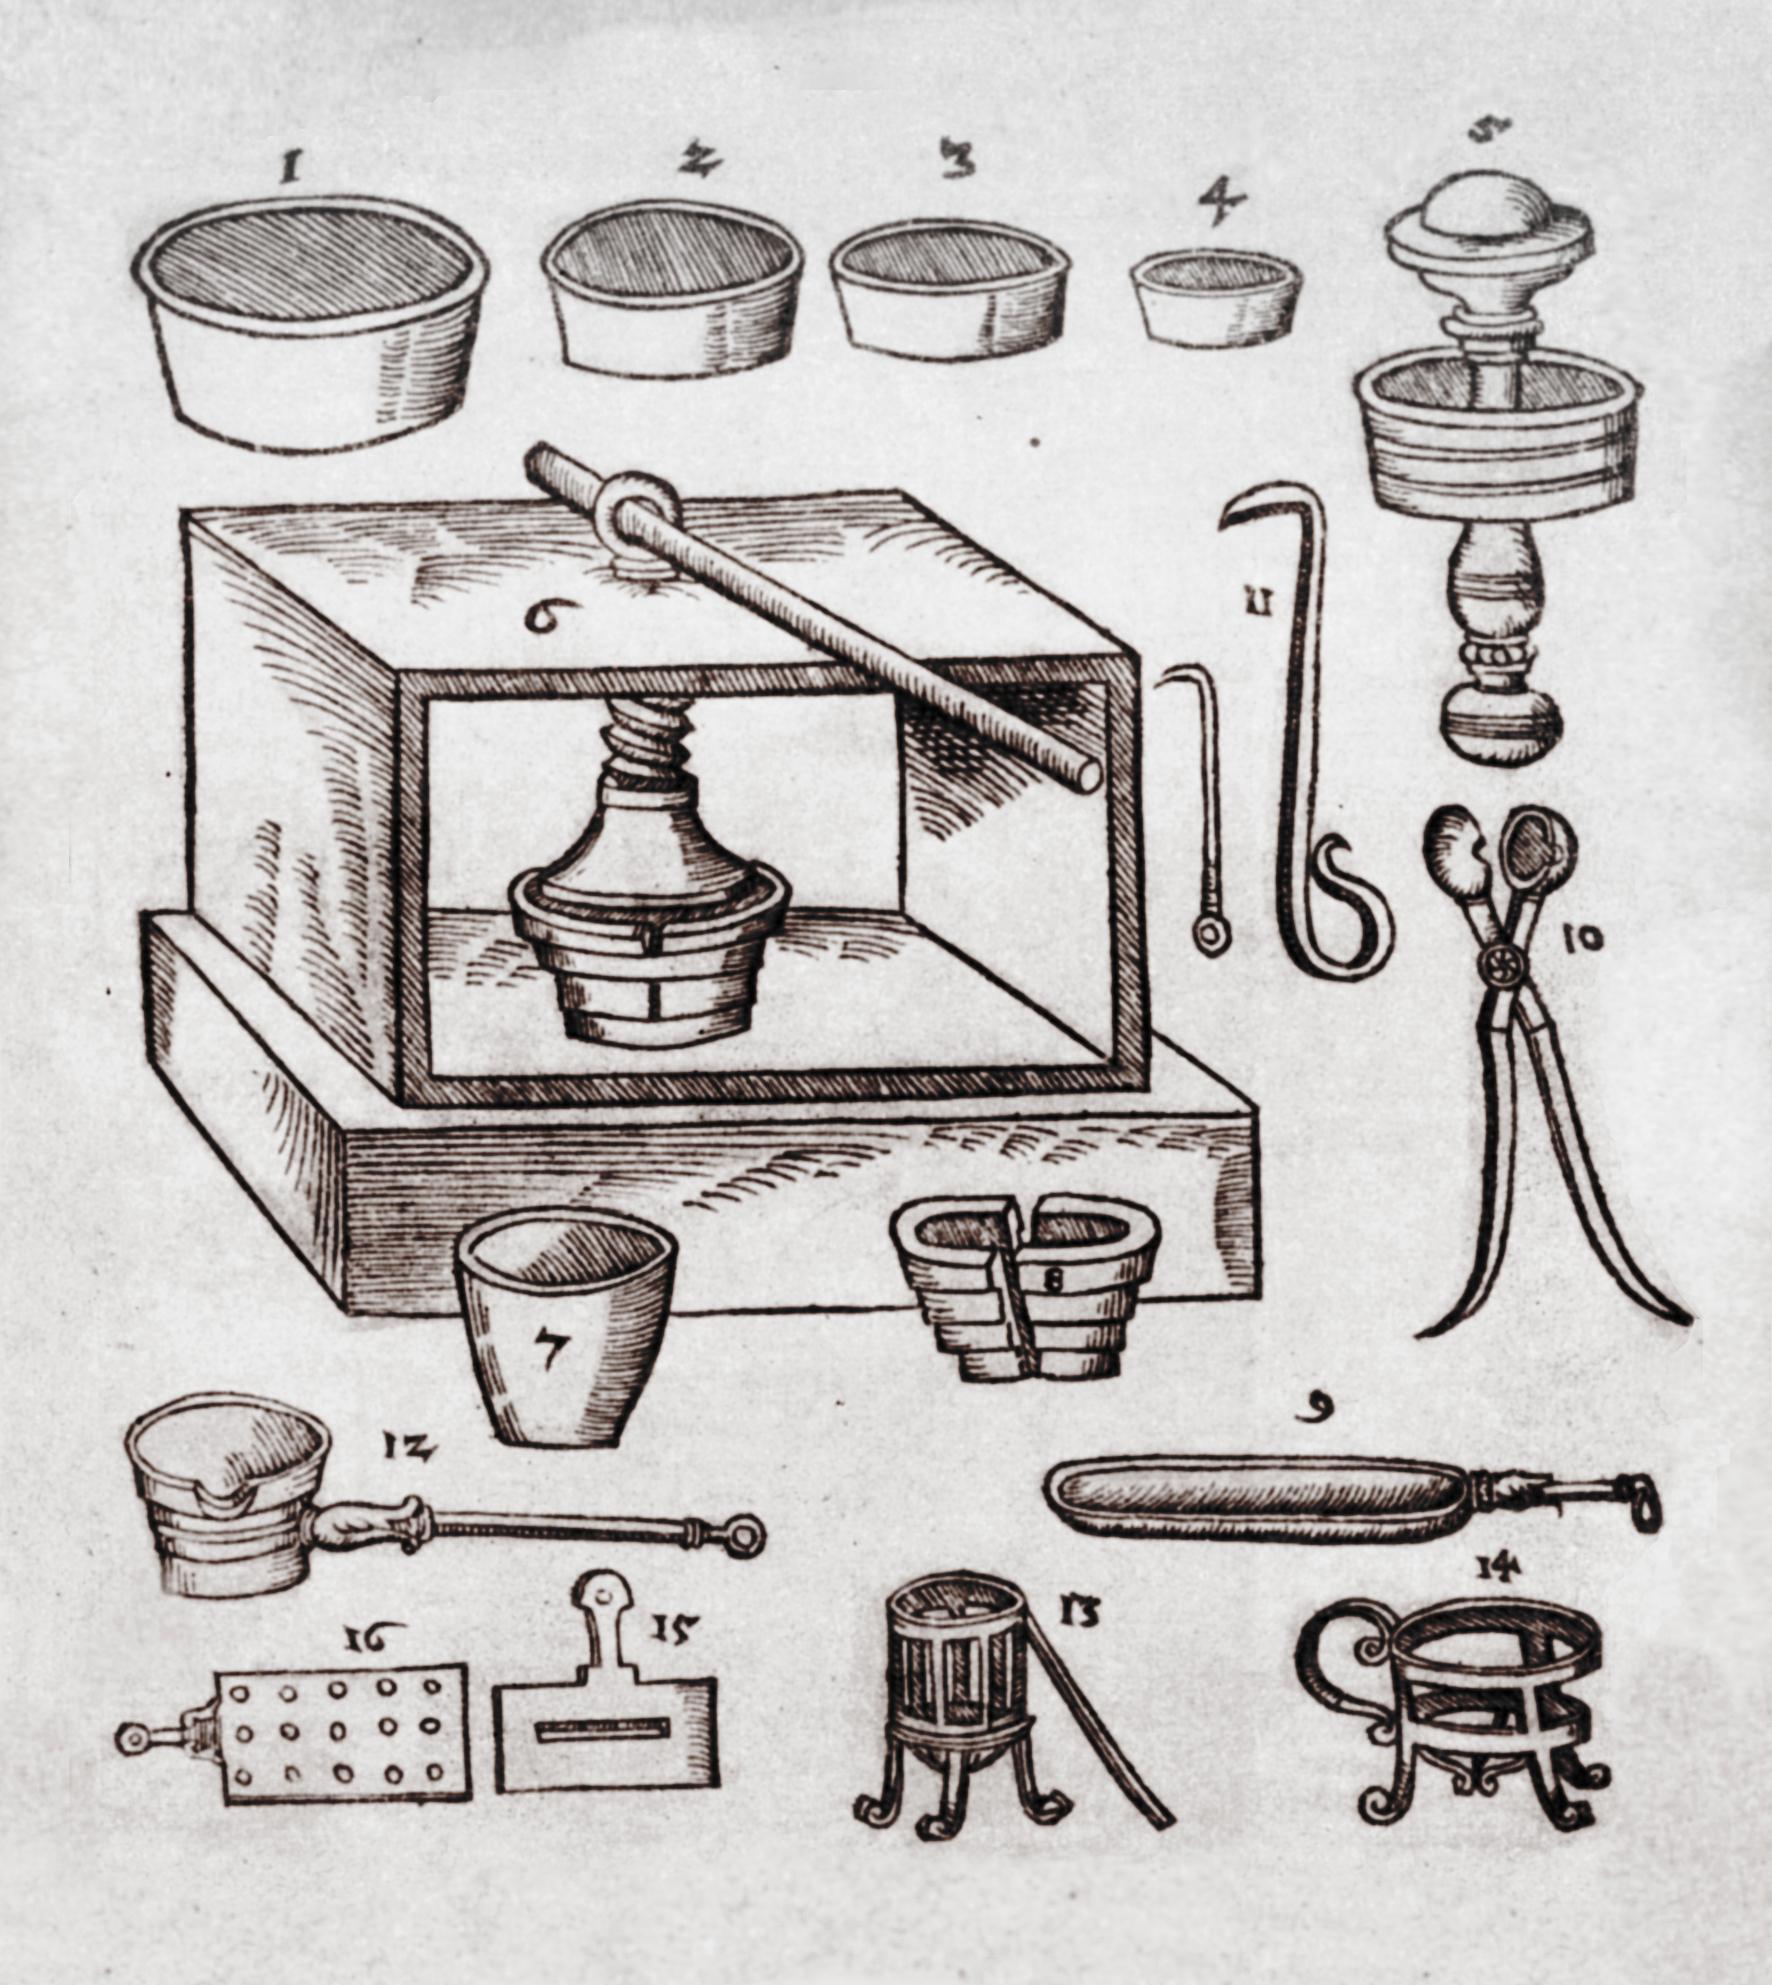 Файл:Tools for assay Andreus Libavius Alchemy 1606.jpg